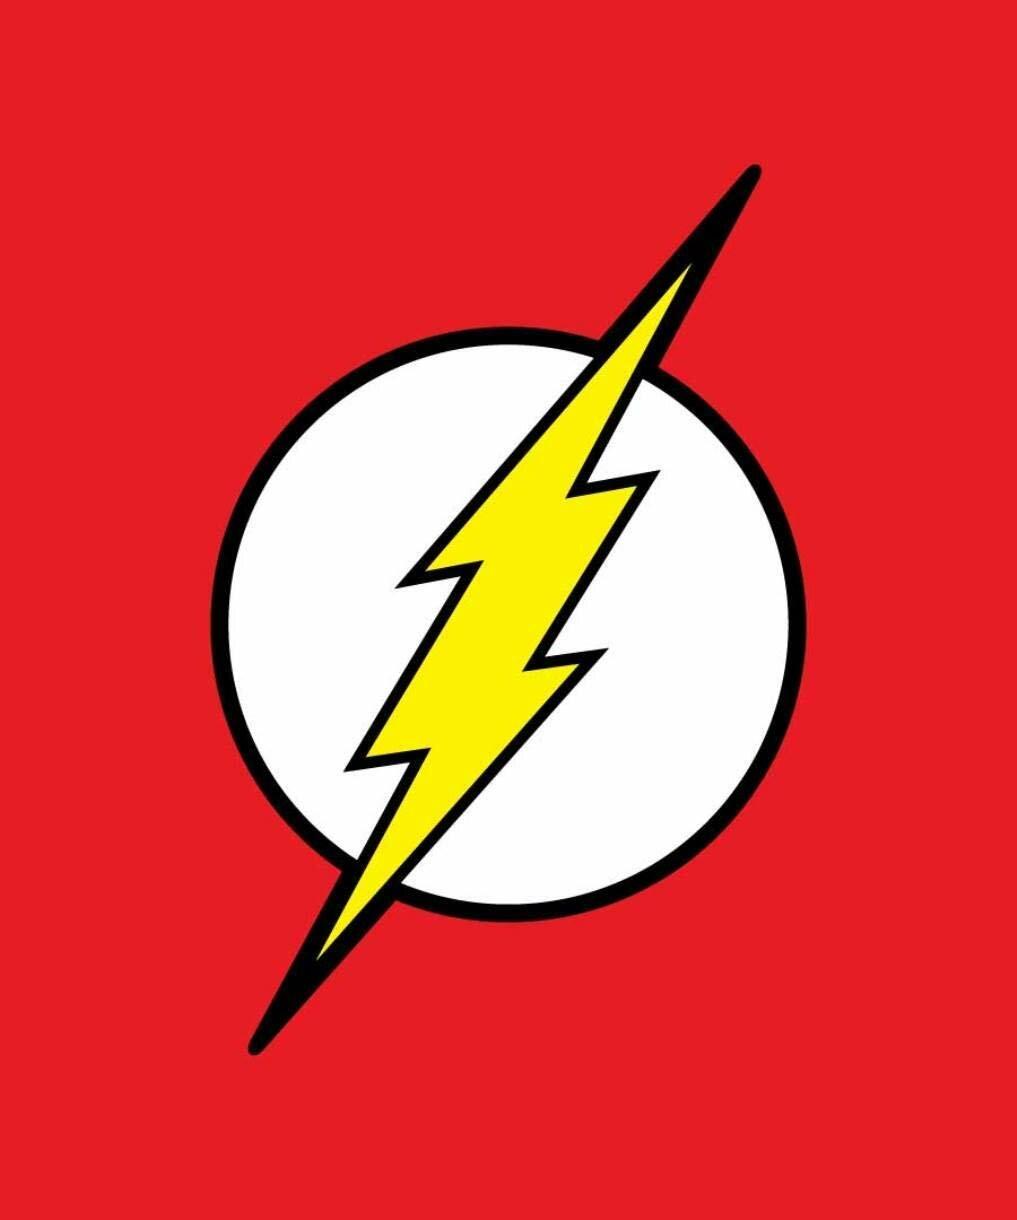 DC Comics Justice League Superhero Super Soft Plush Twin Raschel Blanket